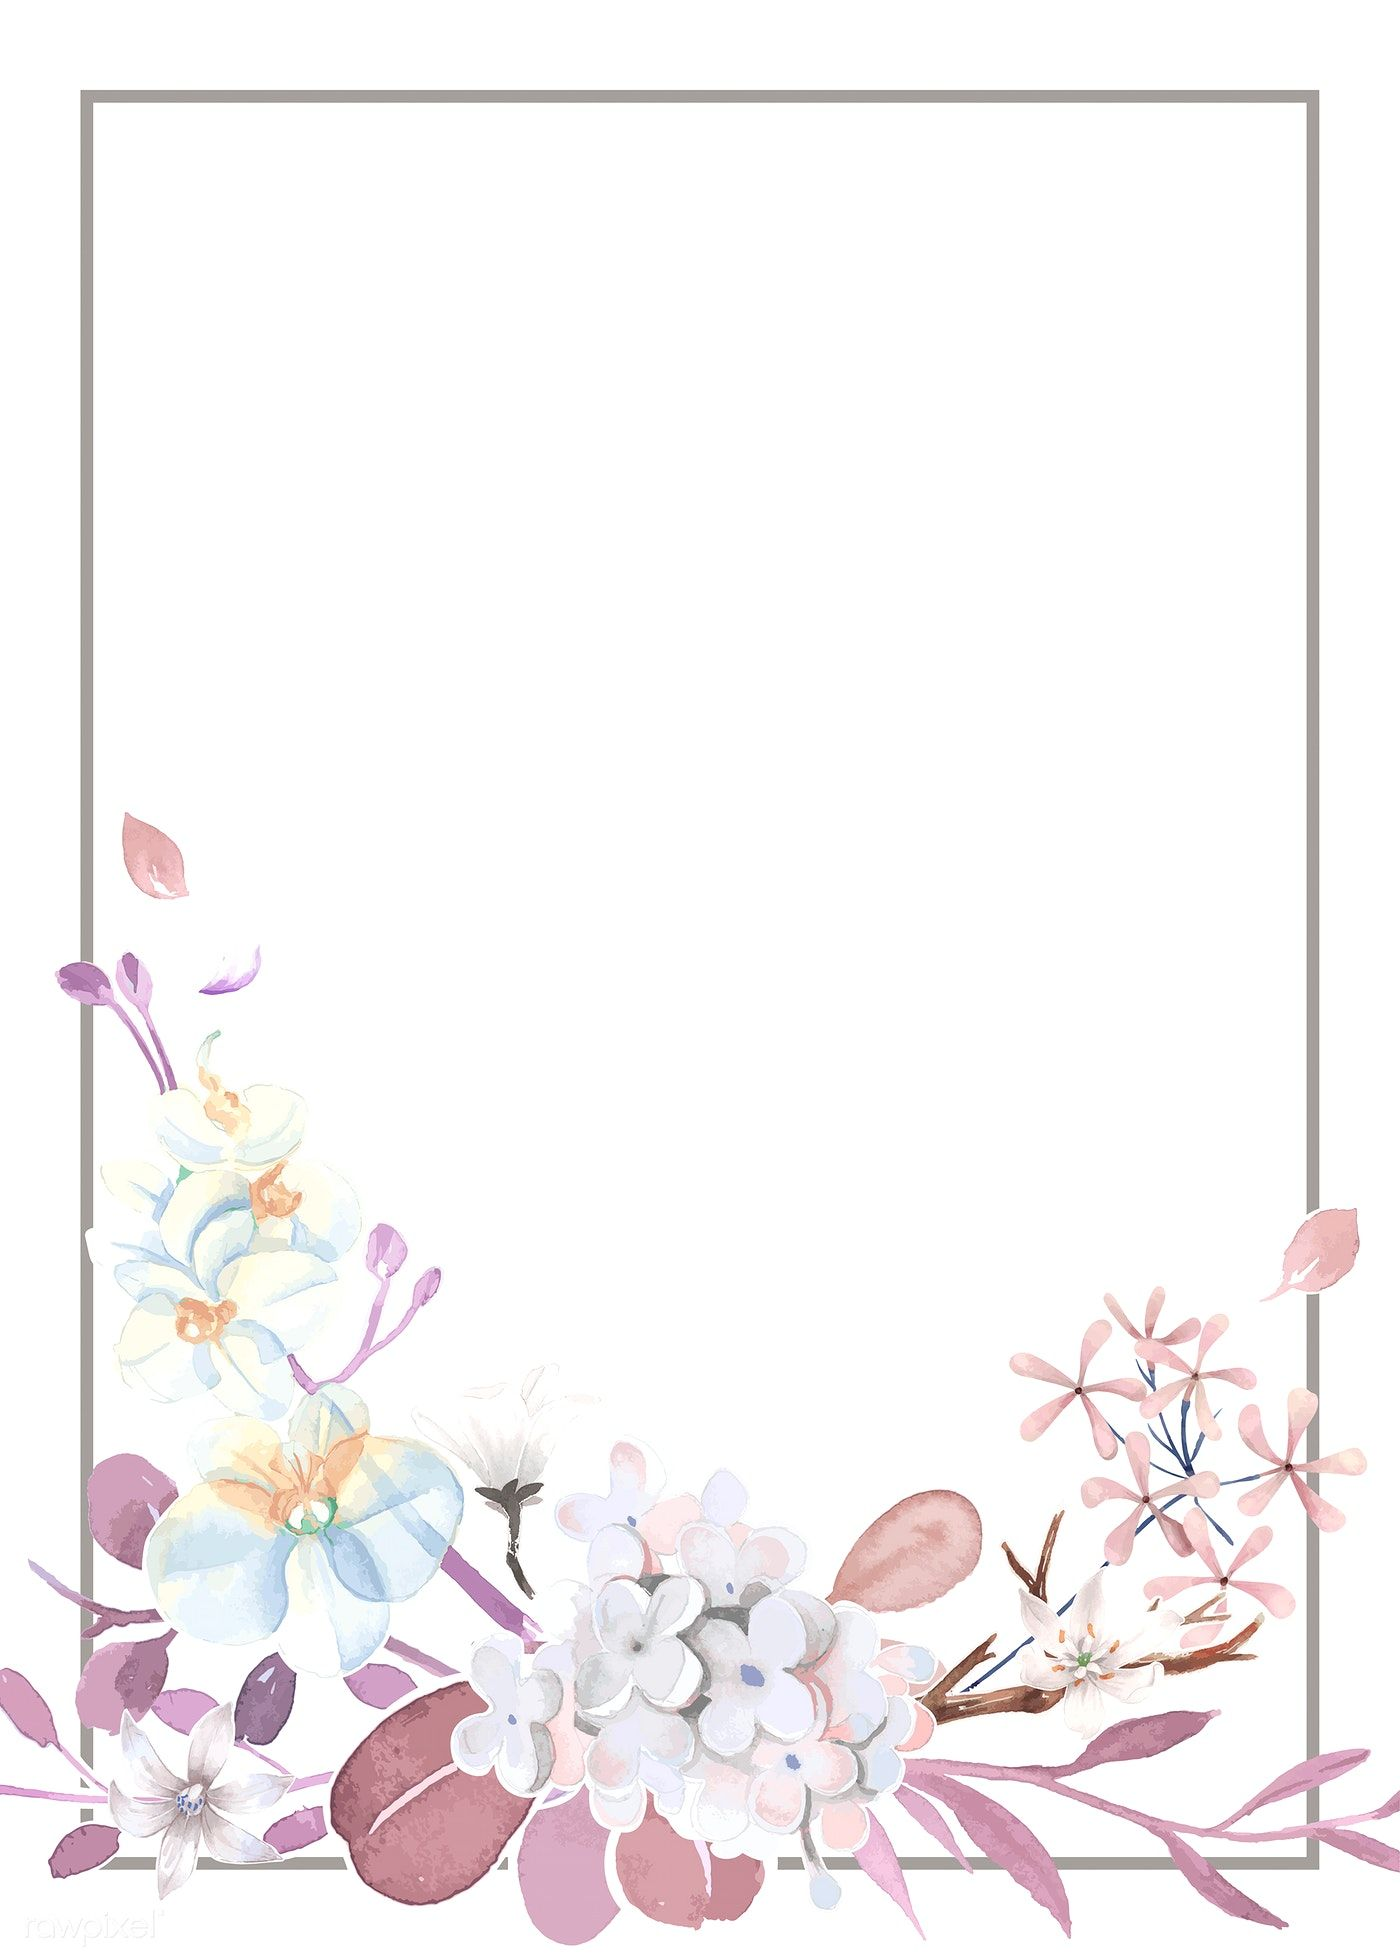 Download Premium Illustration Of Purple And Pink Greeting